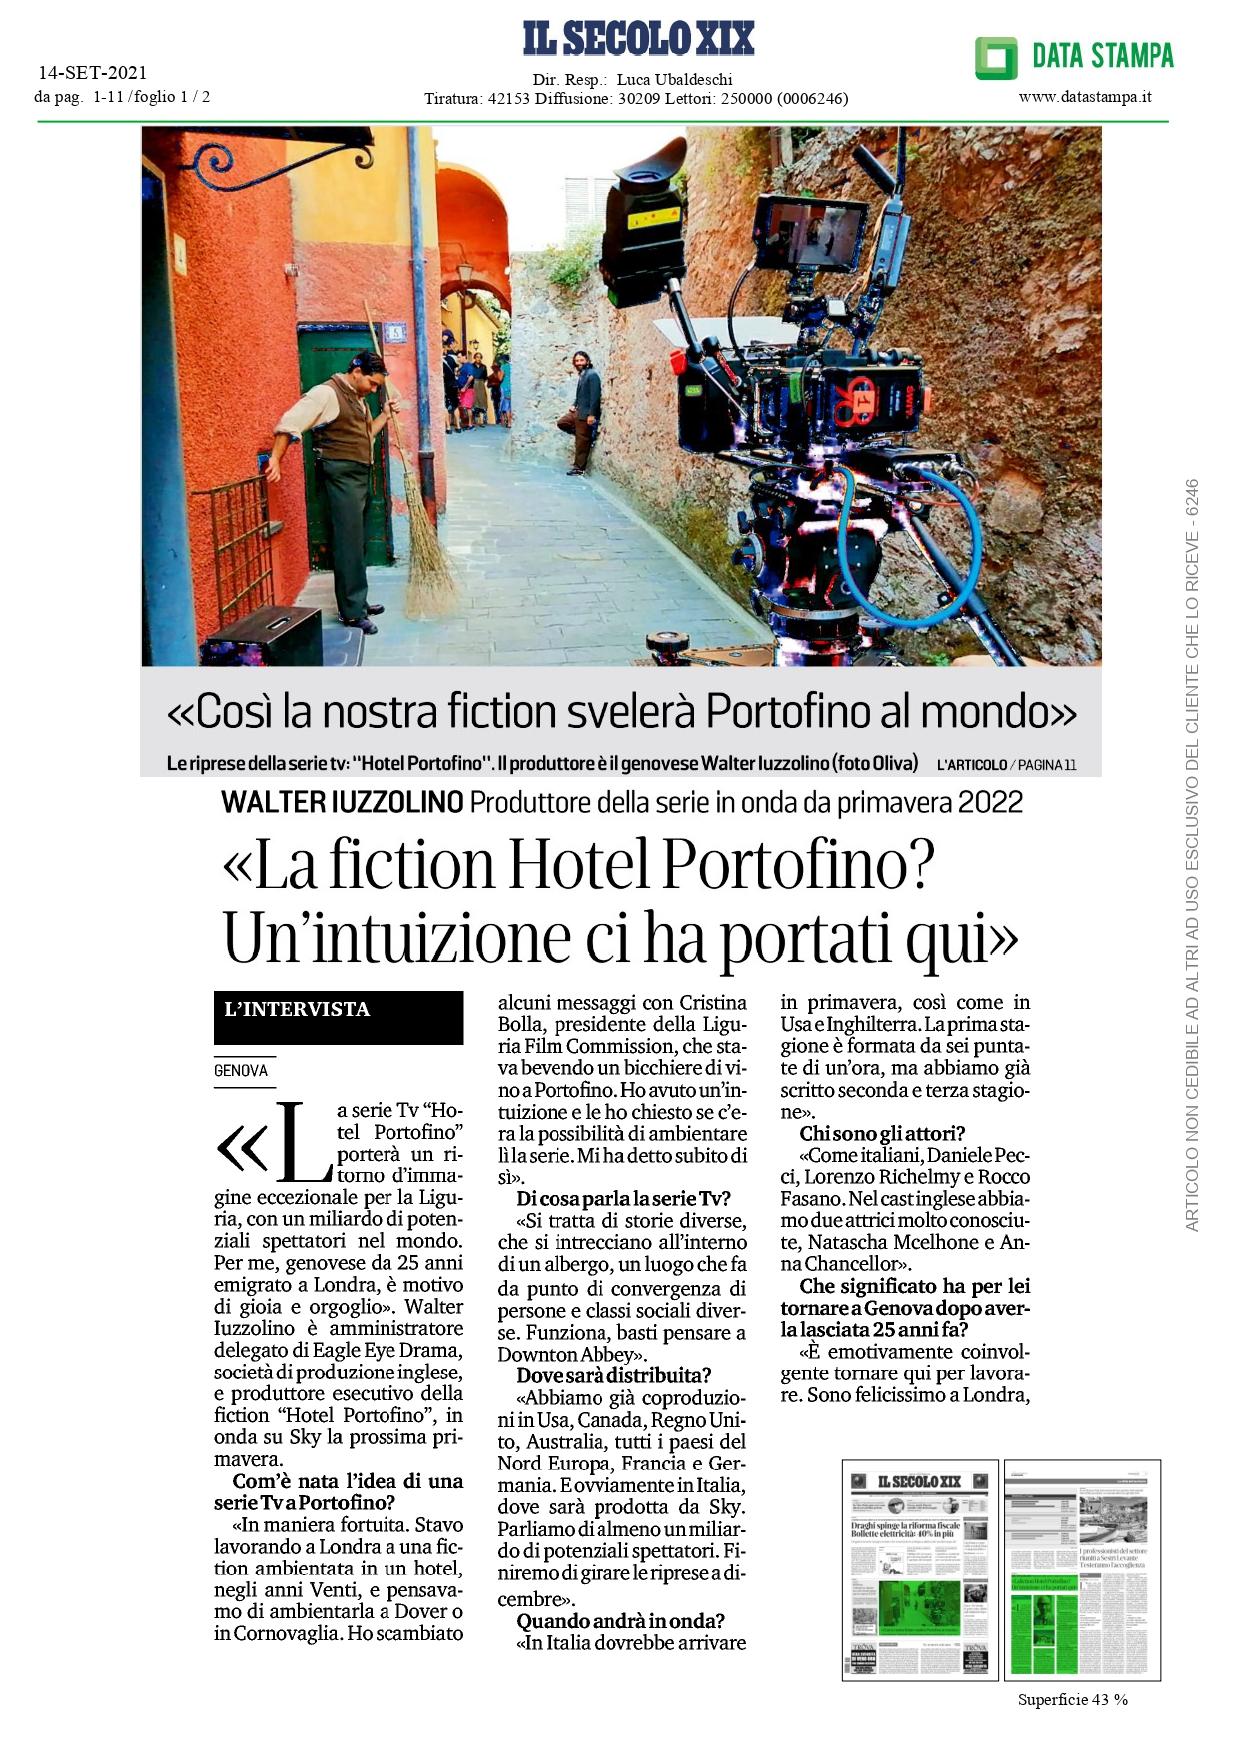 Hotel Portofino 1